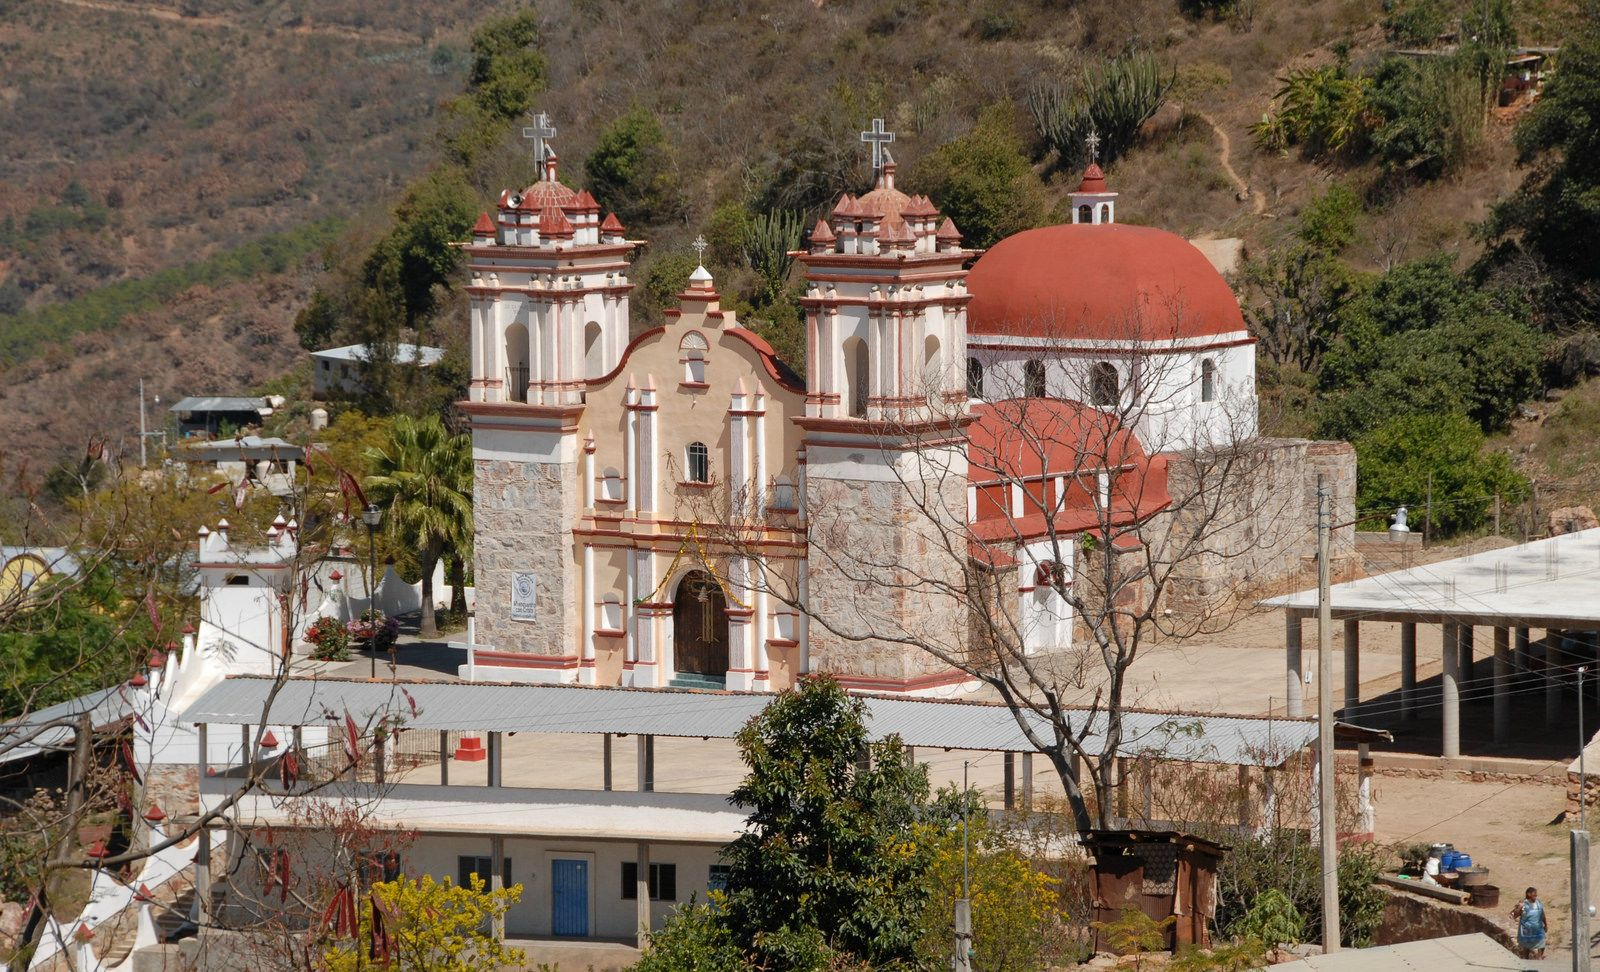 Church oaxaca mexico iglesia by ilhuicamina lugares mágicos